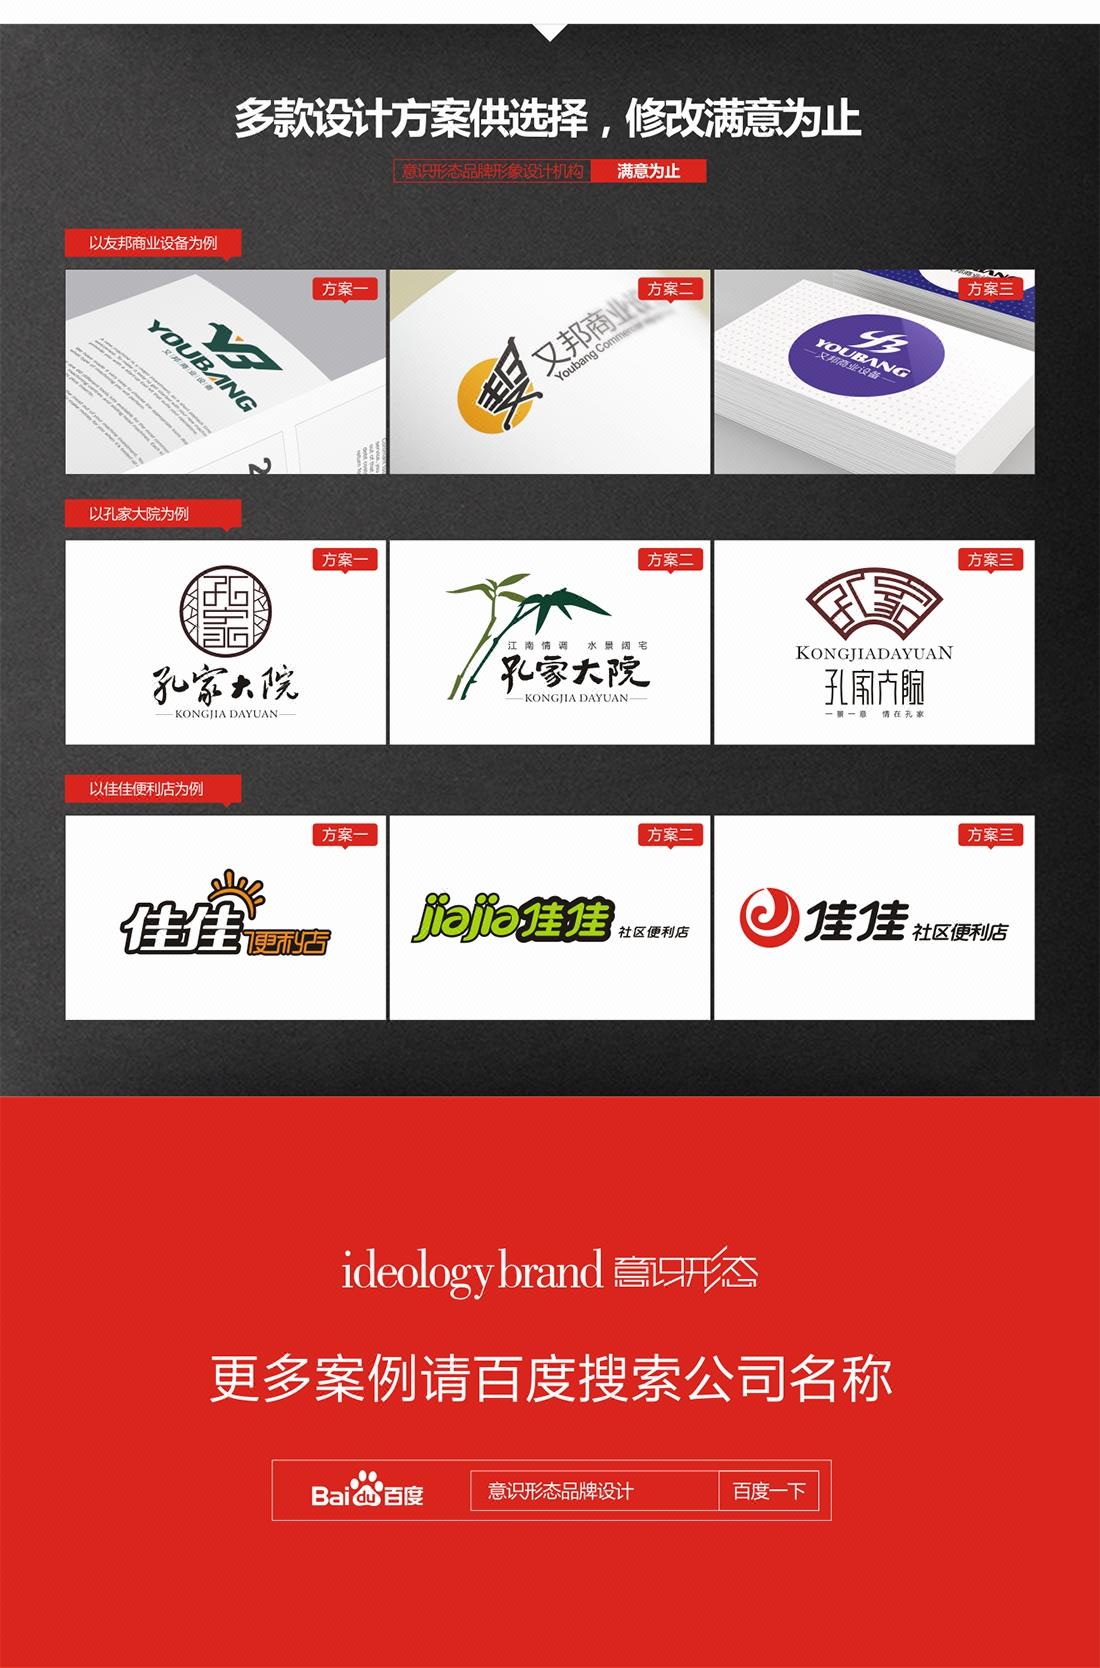 LOGO更新升级_公司企业logo设计平面餐饮门店LOGO图形标志品牌商标设计8